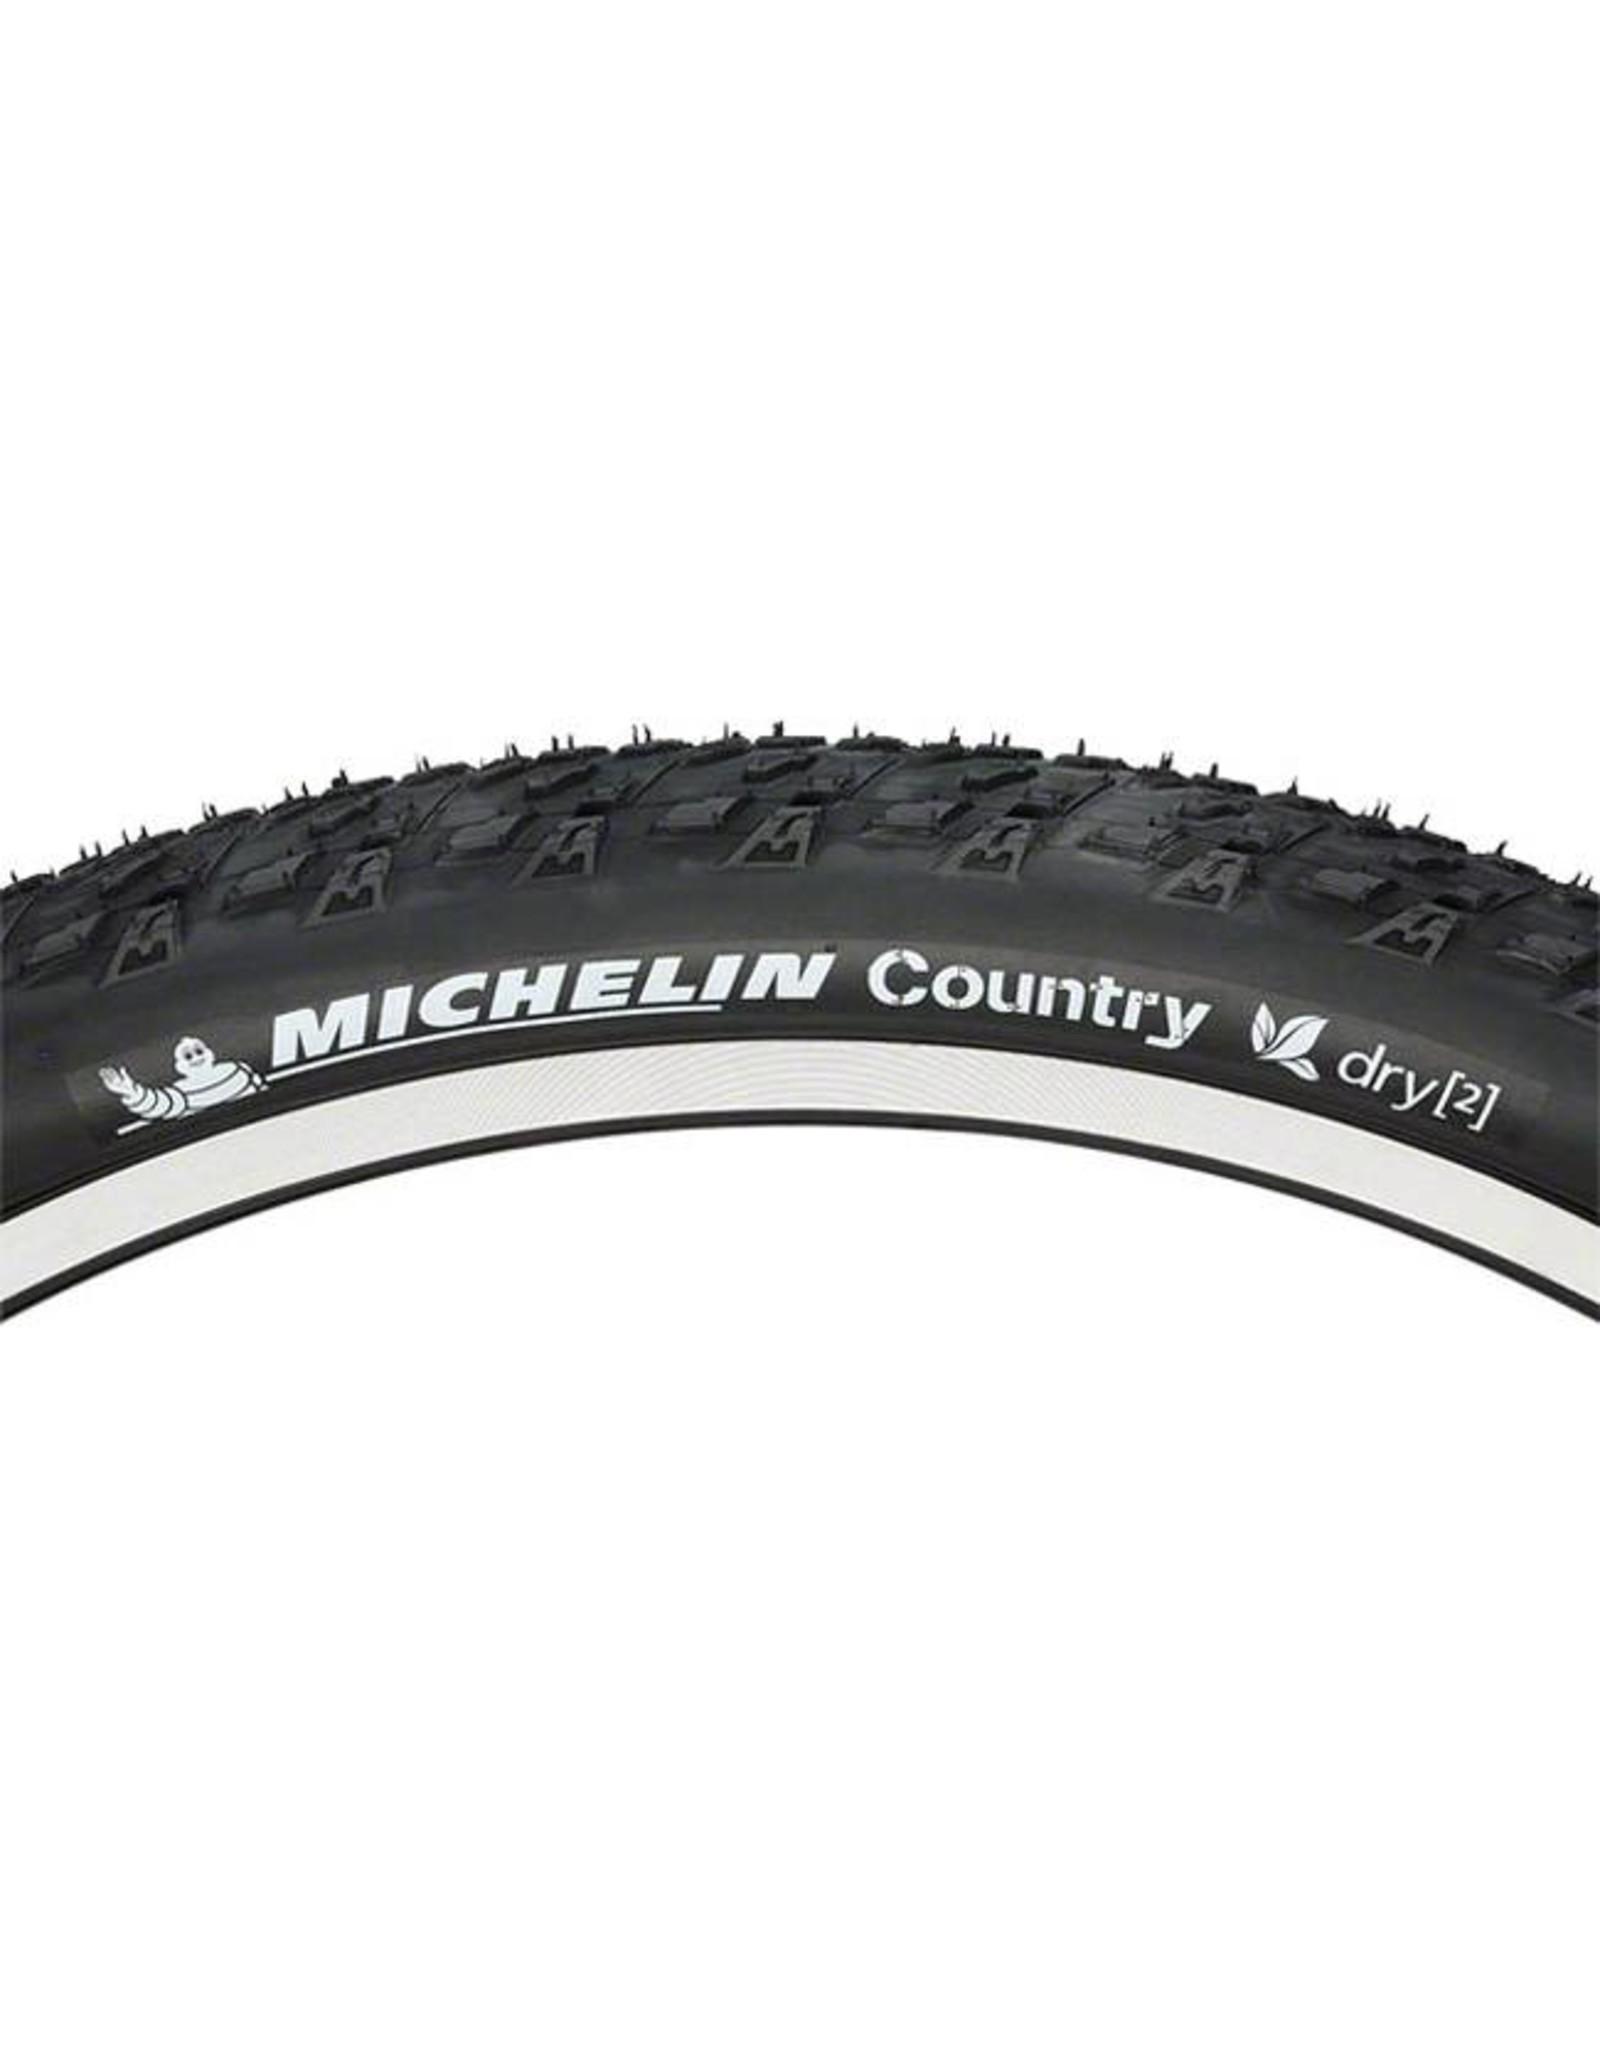 "Michelin Michelin Country Dry 2 Tire, 26x2.0"" Black"